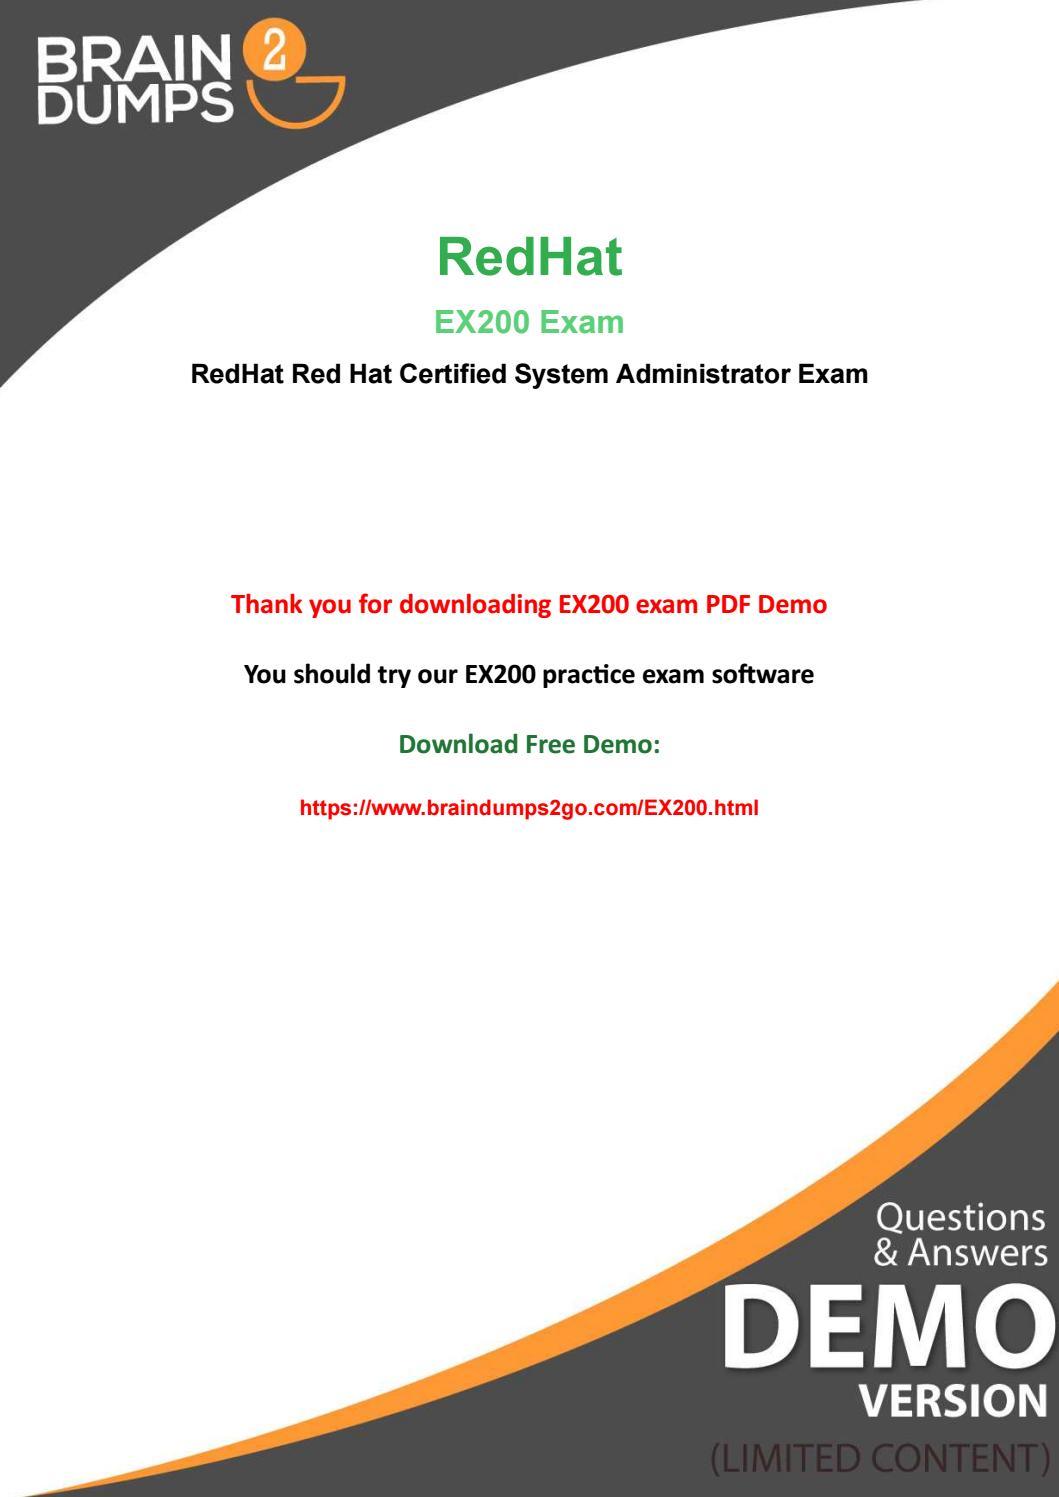 Rhel 6 exam dumps free download